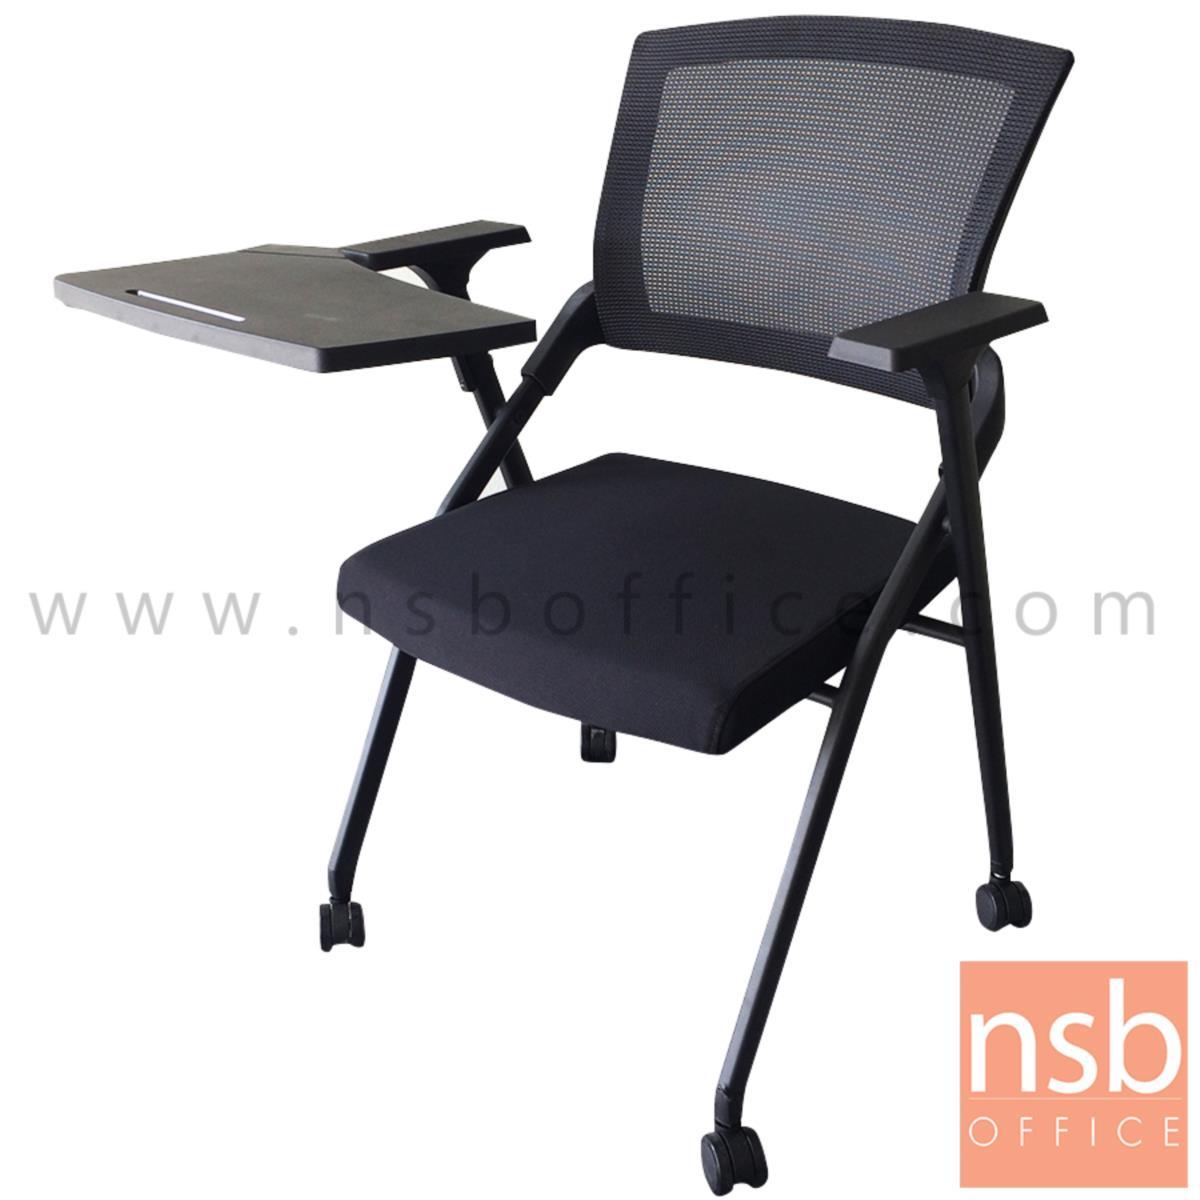 B07A098:เก้าอี้เลคเชอร์หลังเน็ตล้อเลื่อน รุ่น Kerr (เคอร์ )  ขาเหล็กพ่นดำ